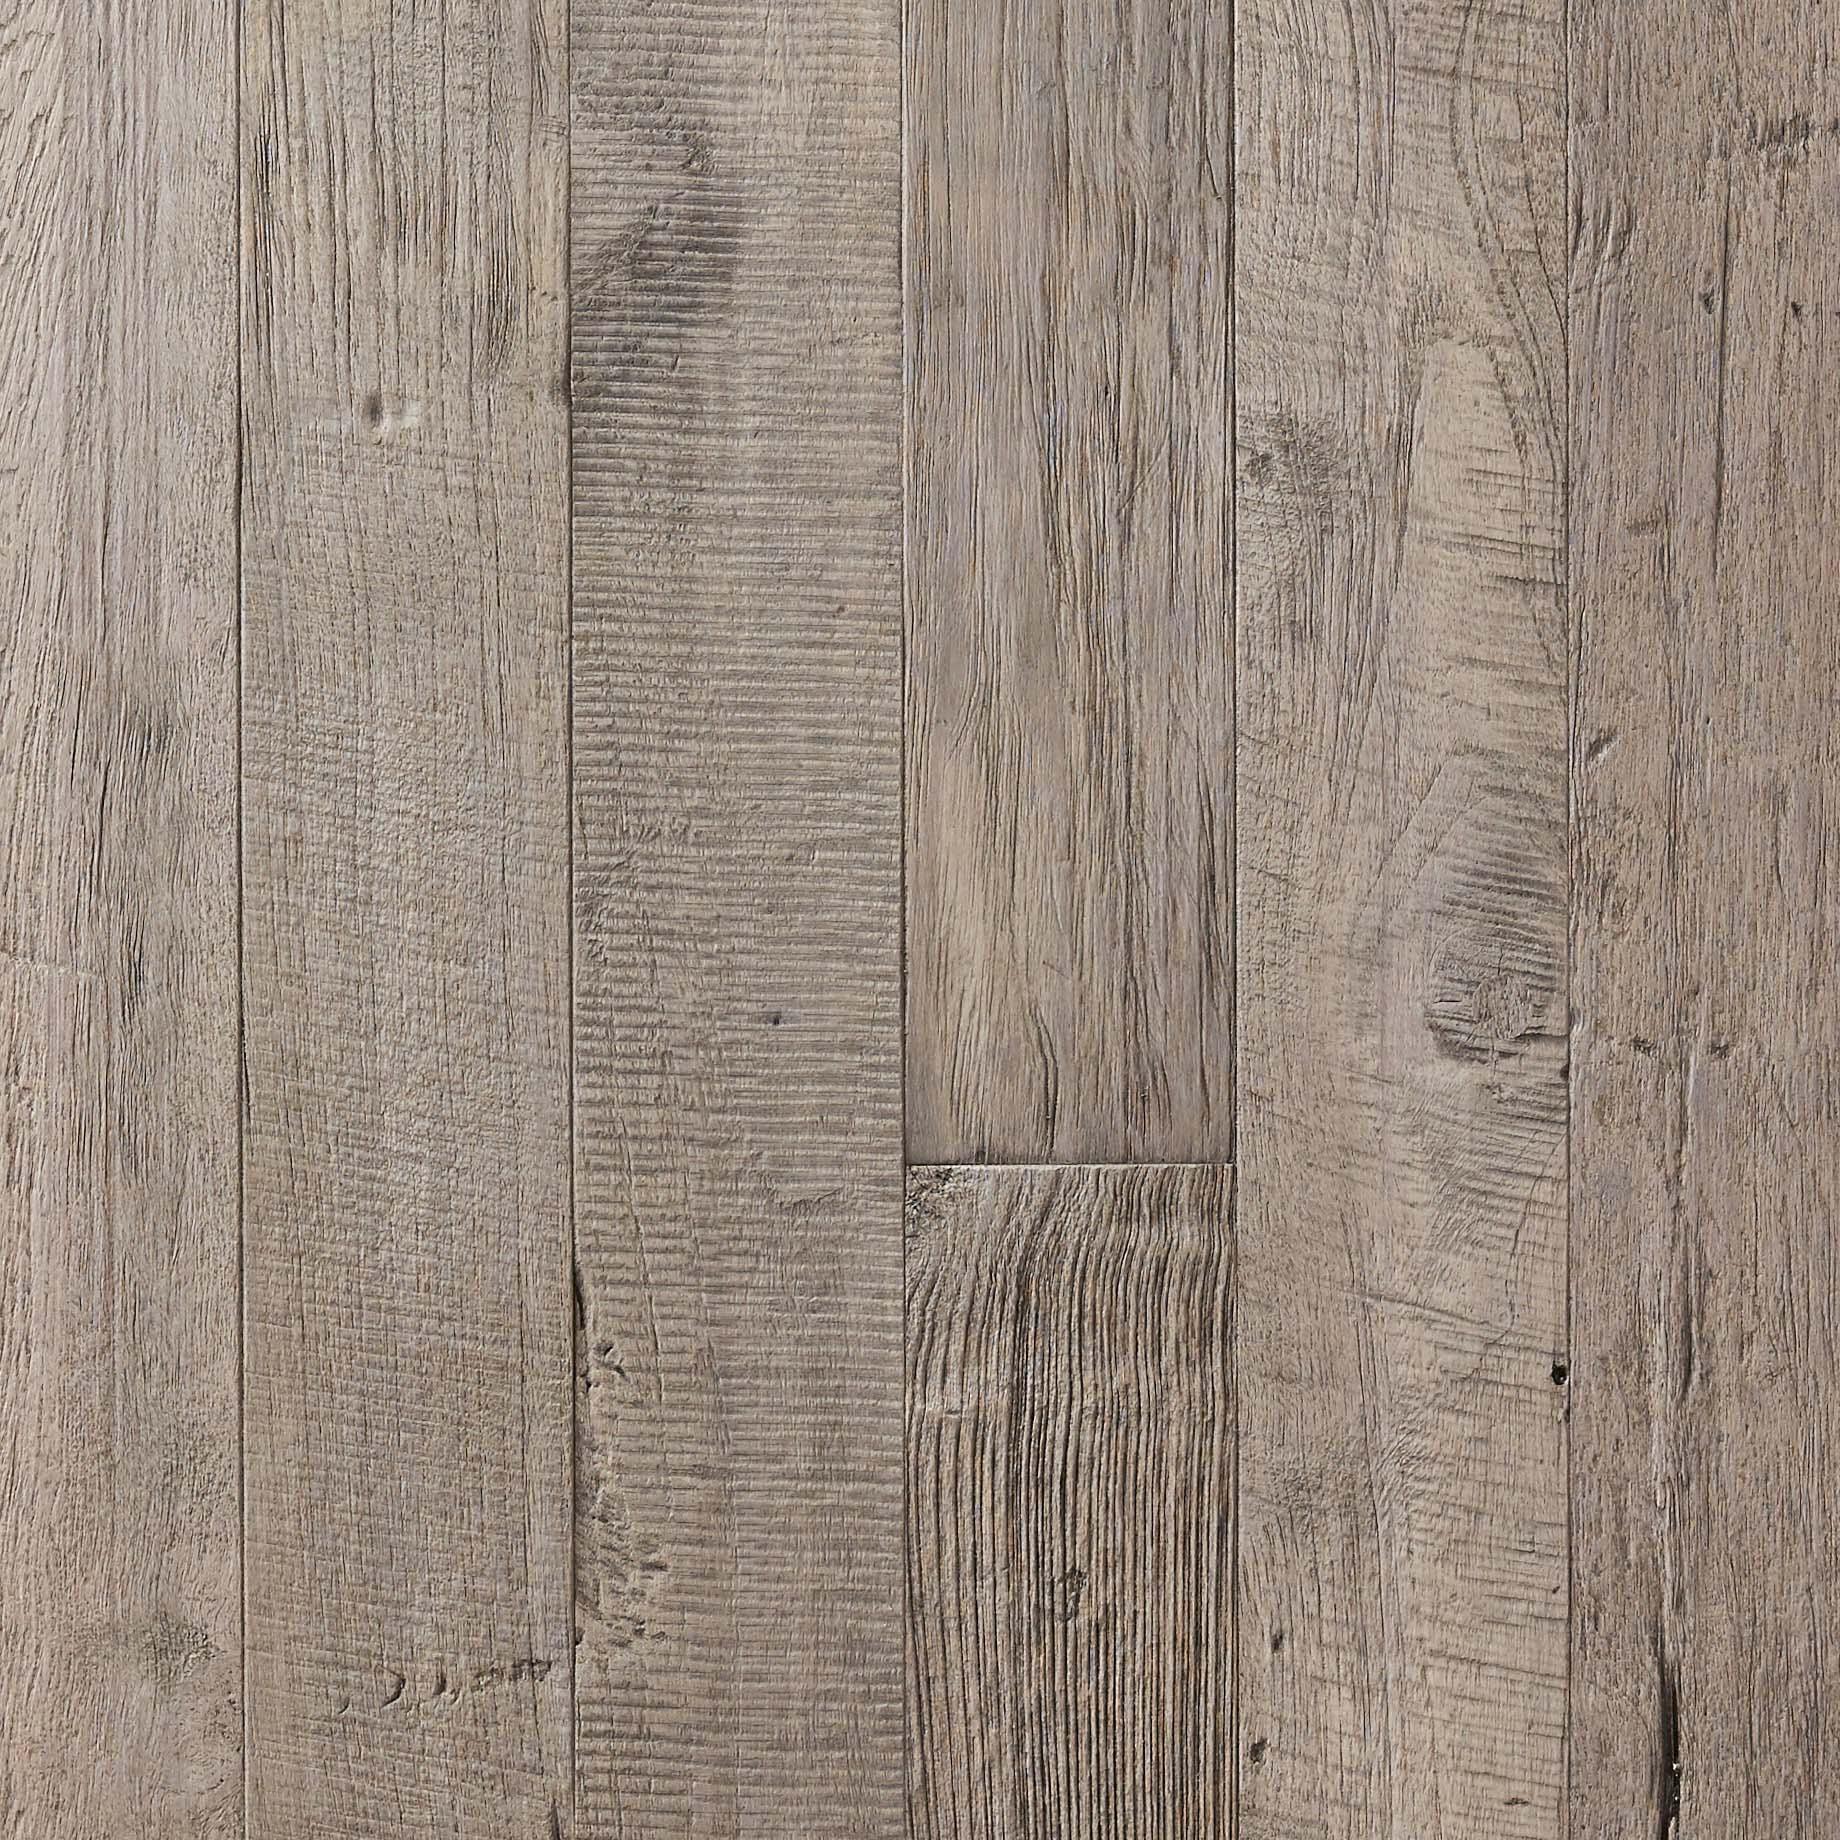 patina ash - Reclaimed Teak Flooring